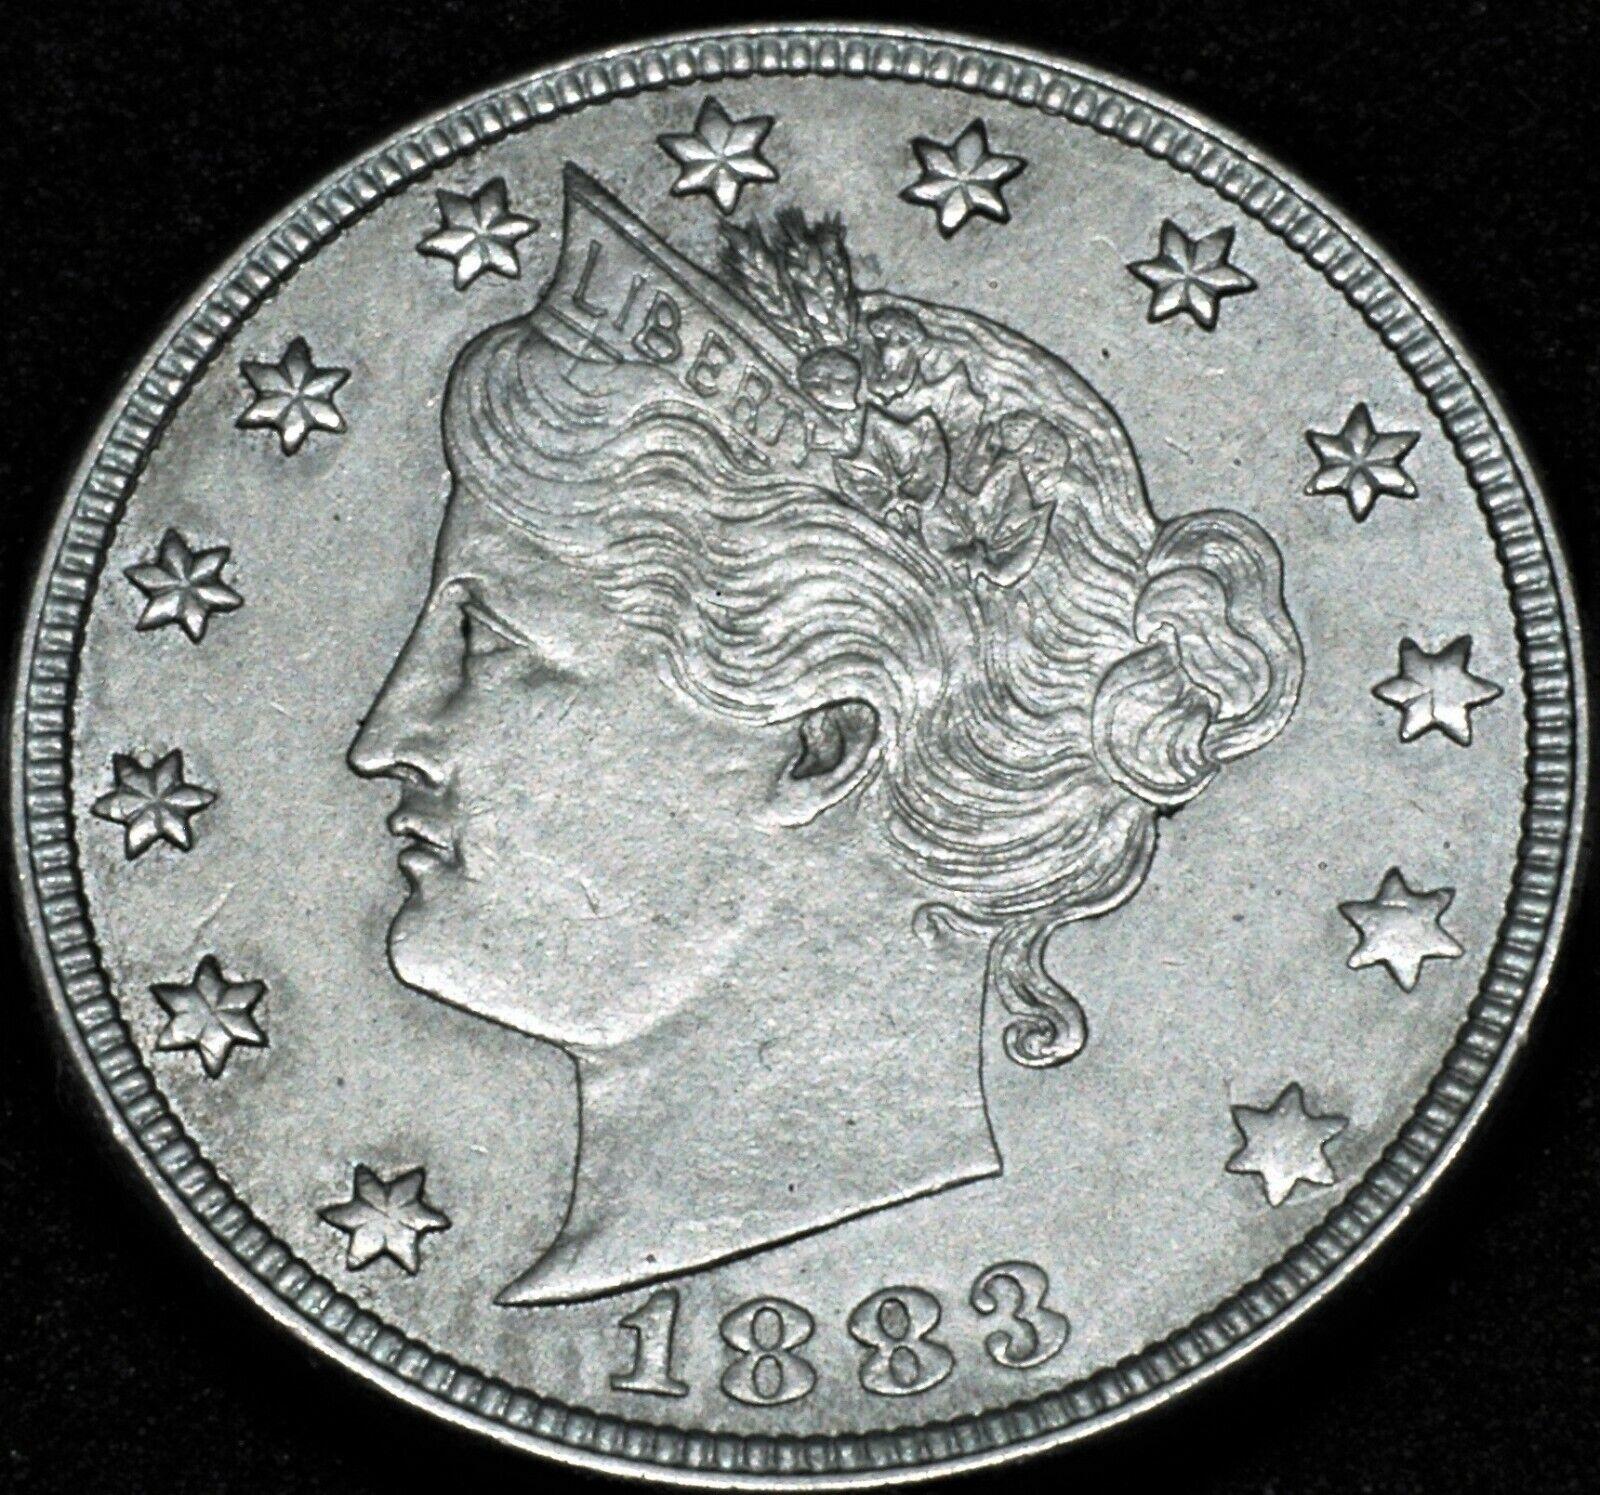 1883 U.S. Liberty V- Nickel 5c AU Details No Cents Victory Nickel - $7.95